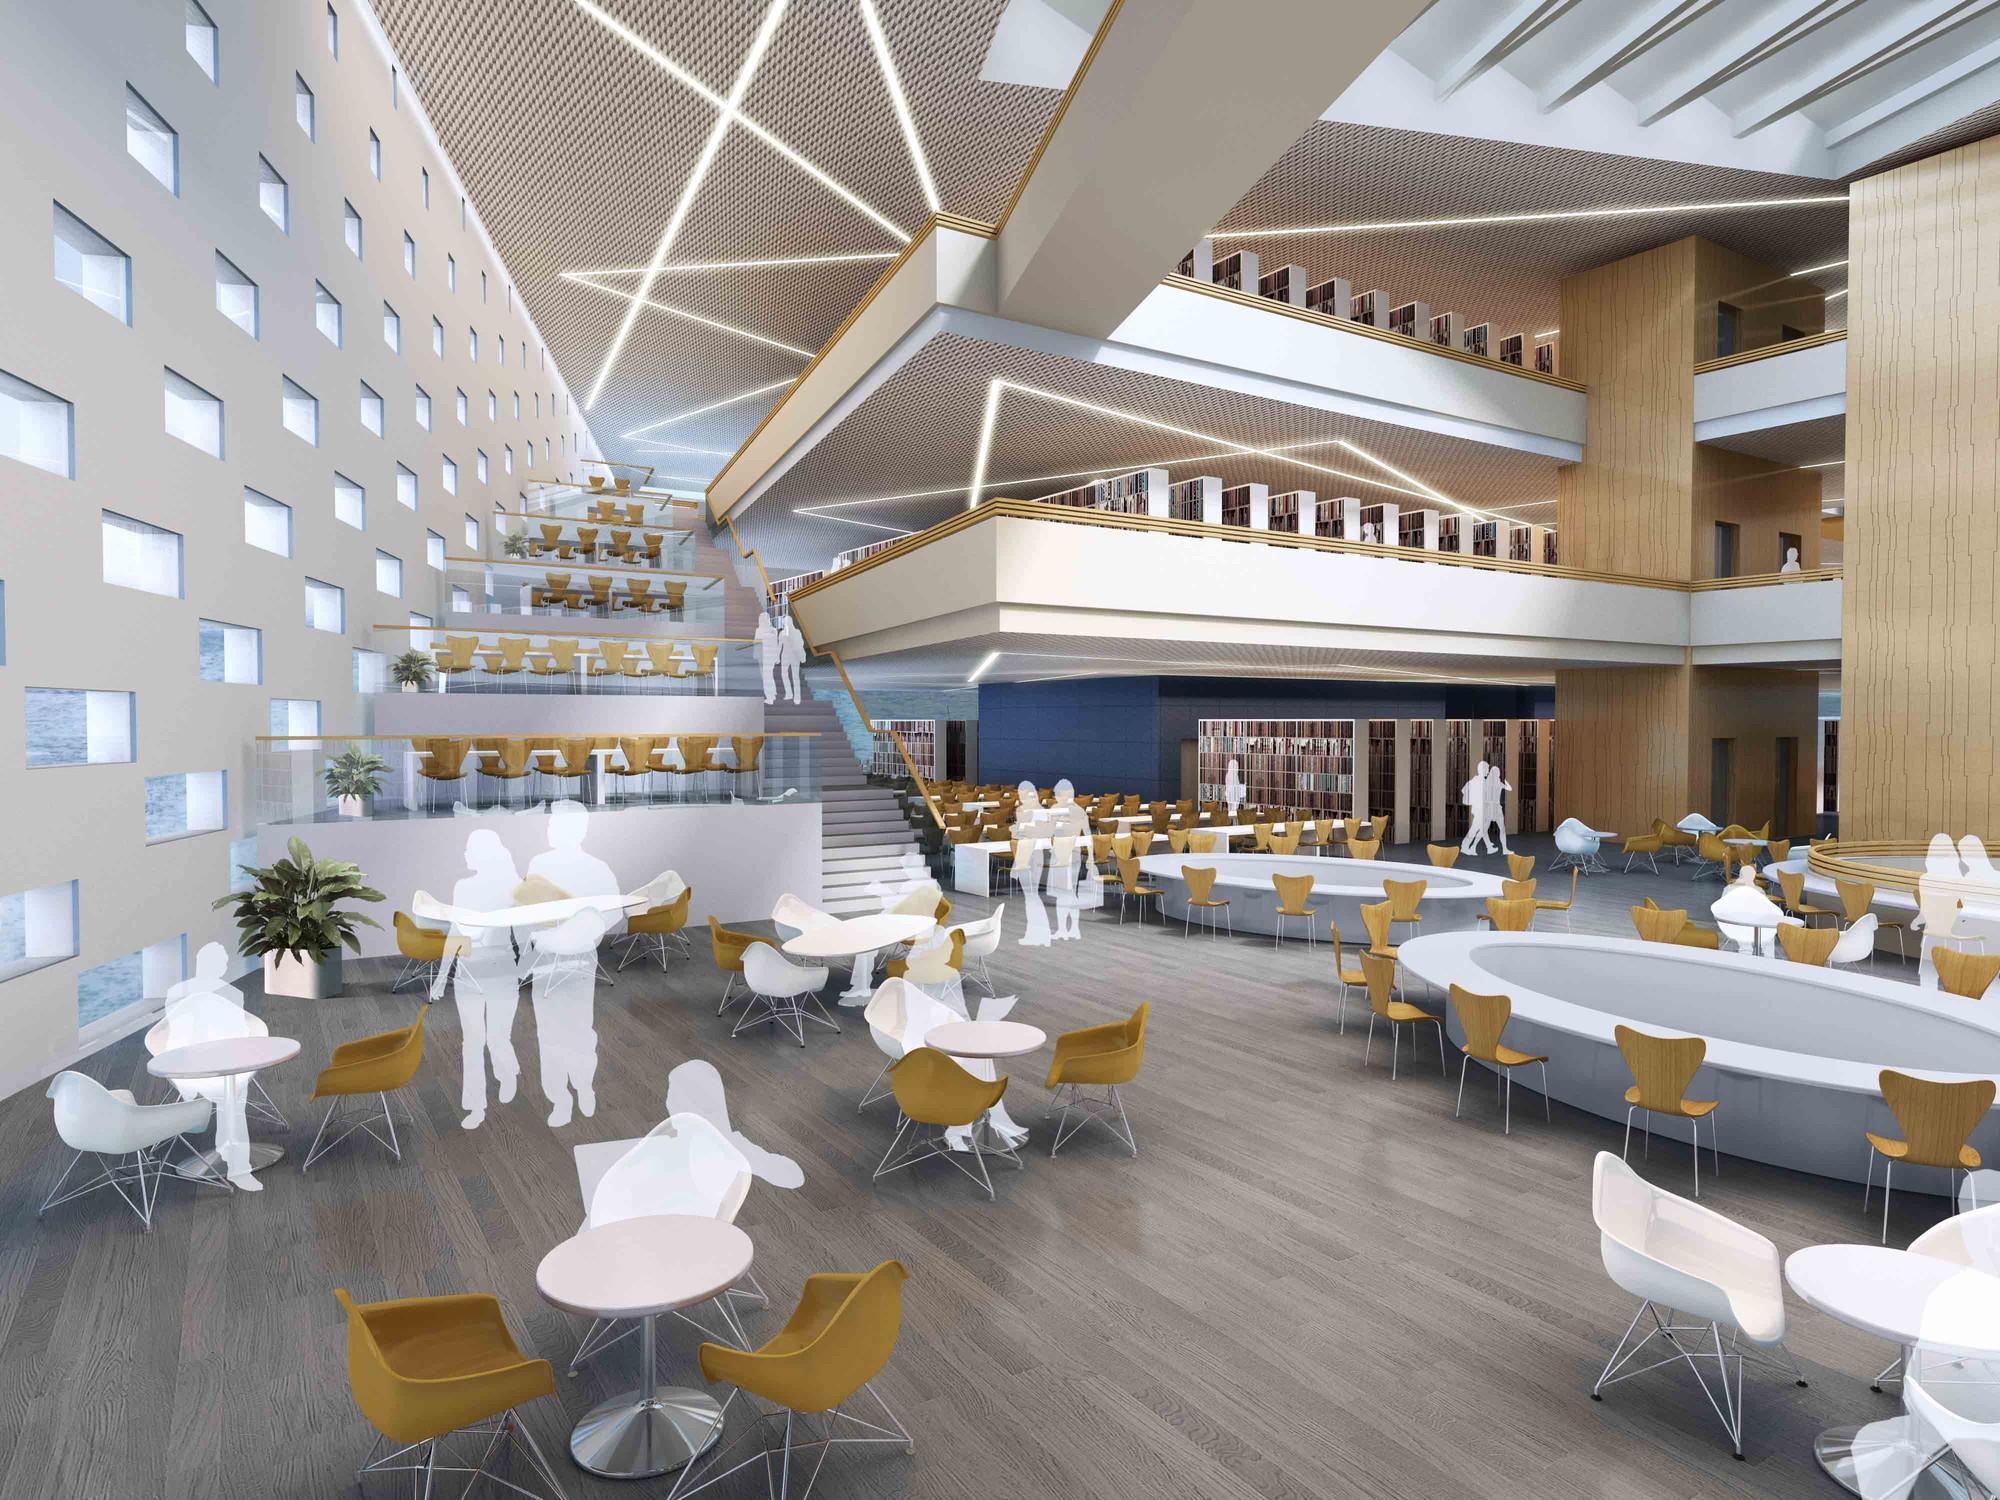 University Library Interior Design